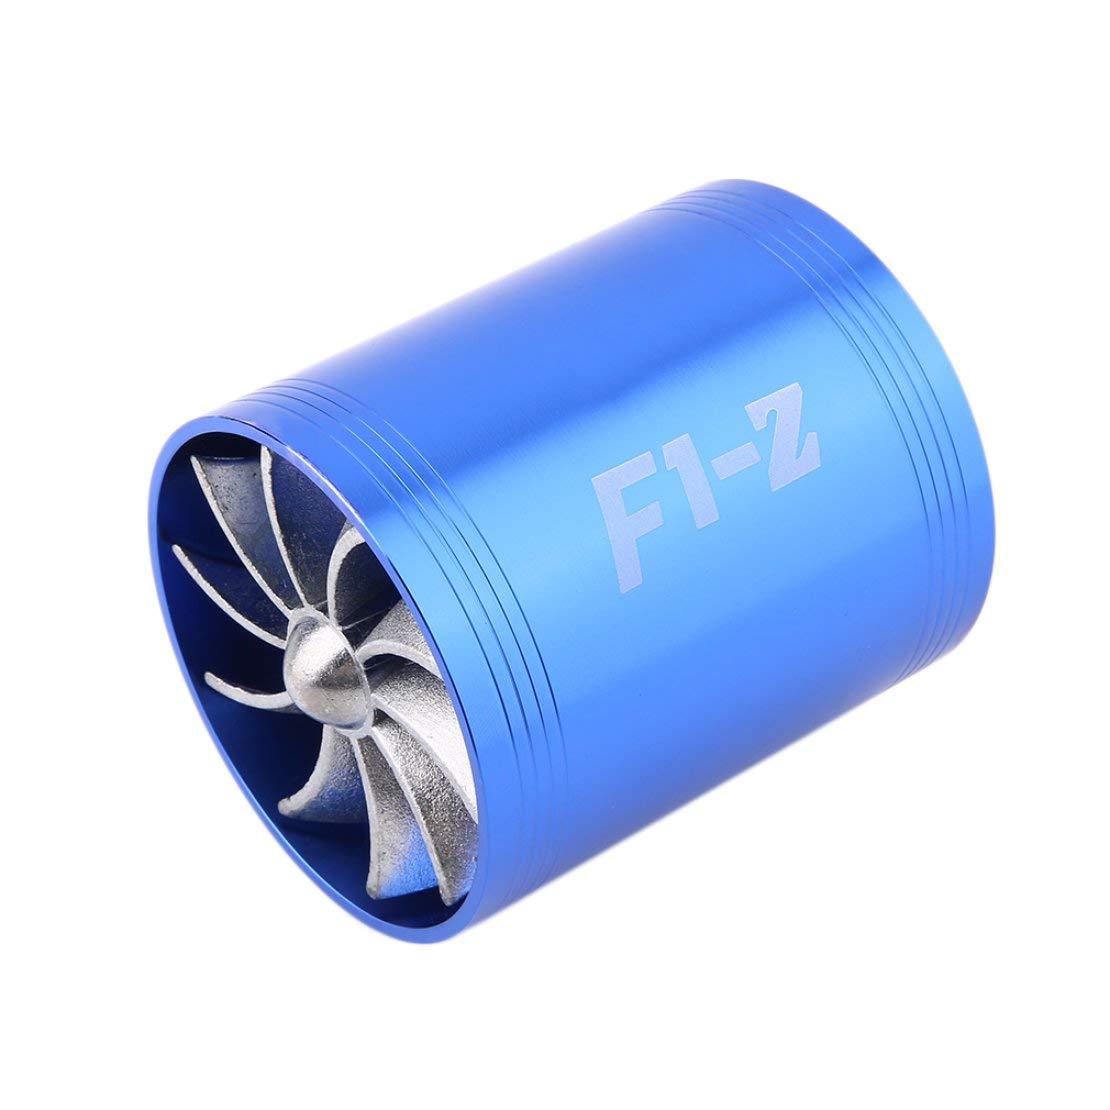 Universal Durable Practical Super Charger Double Turbonator Air Intake Fuel Saver Turbo Cargador Fan